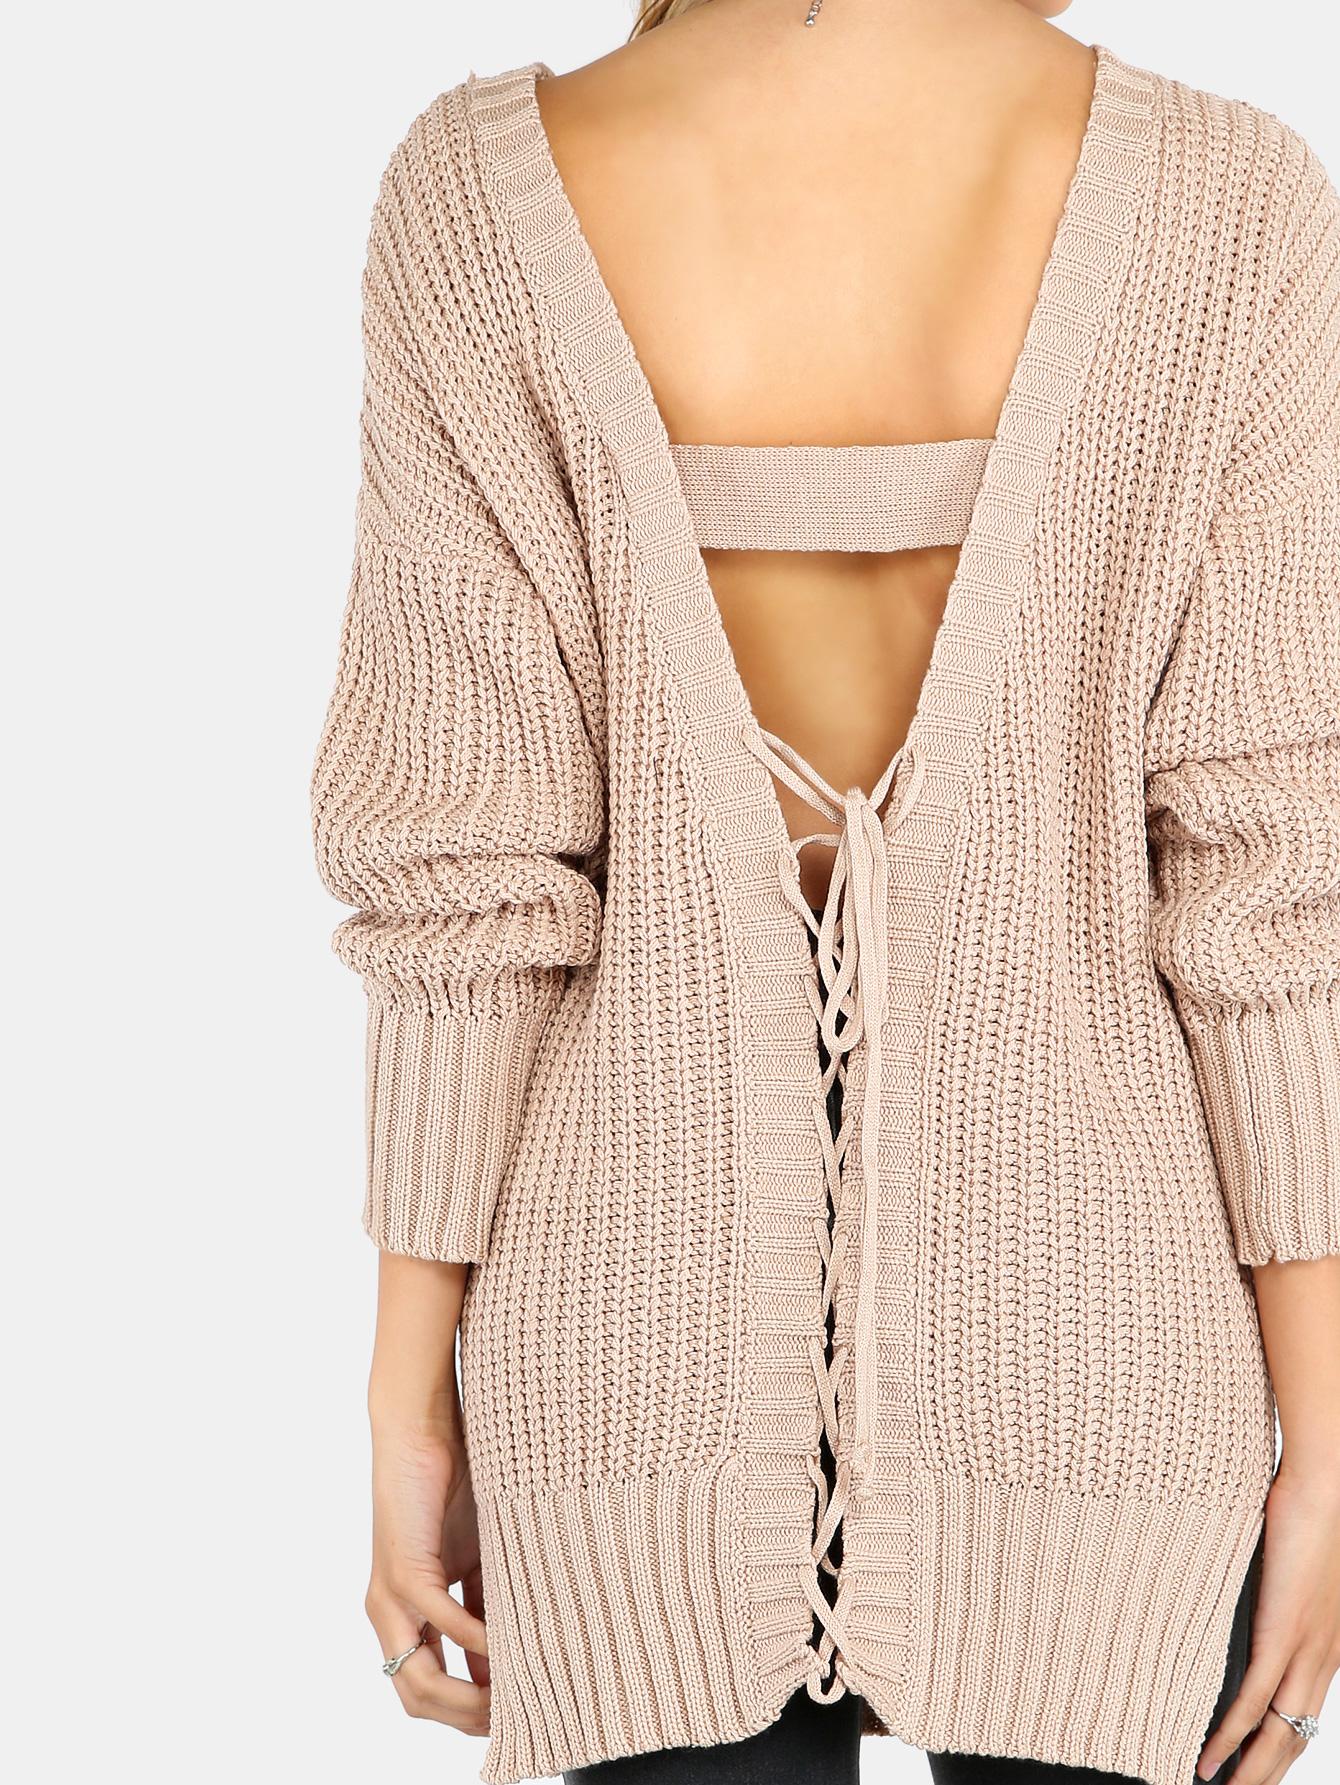 Plunging V Lace Up Back Knit Sweater CAMEL -SheIn(Sheinside)